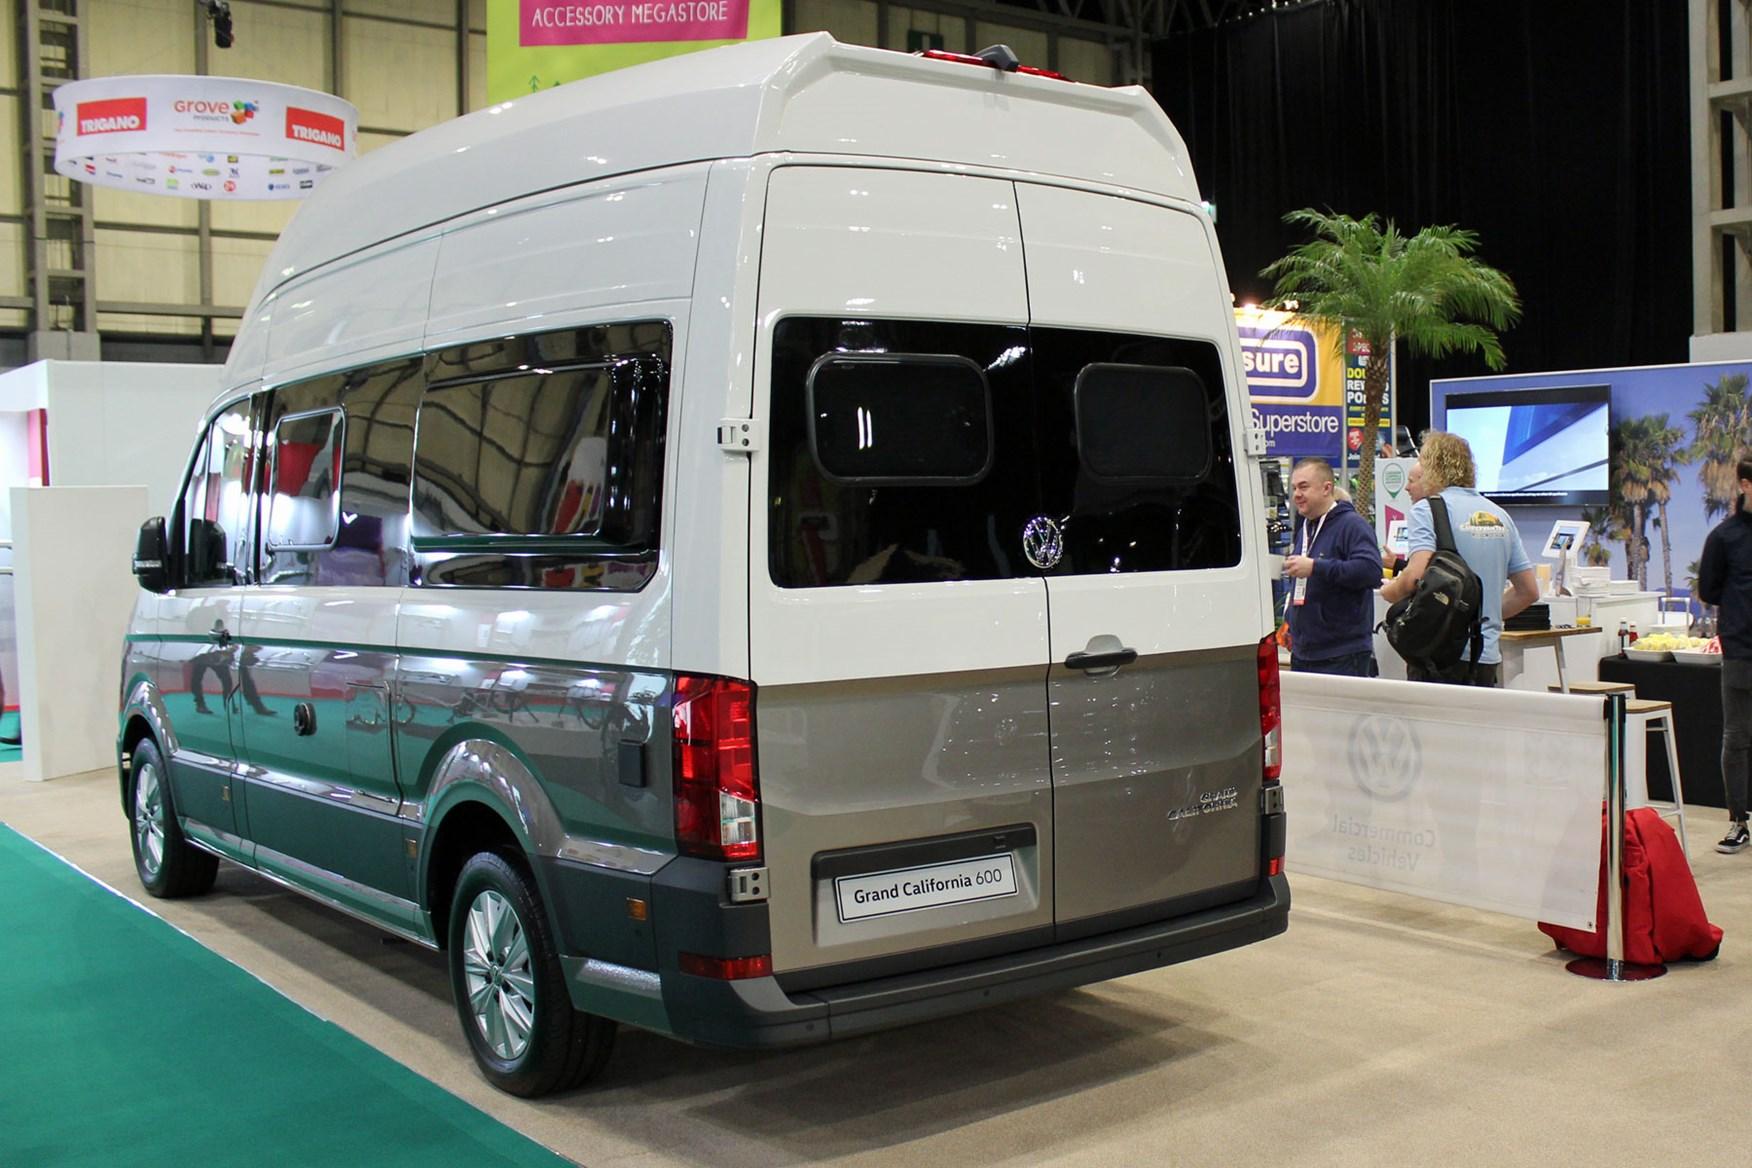 Volkswagen Grand California campervan makes UK debut - full details